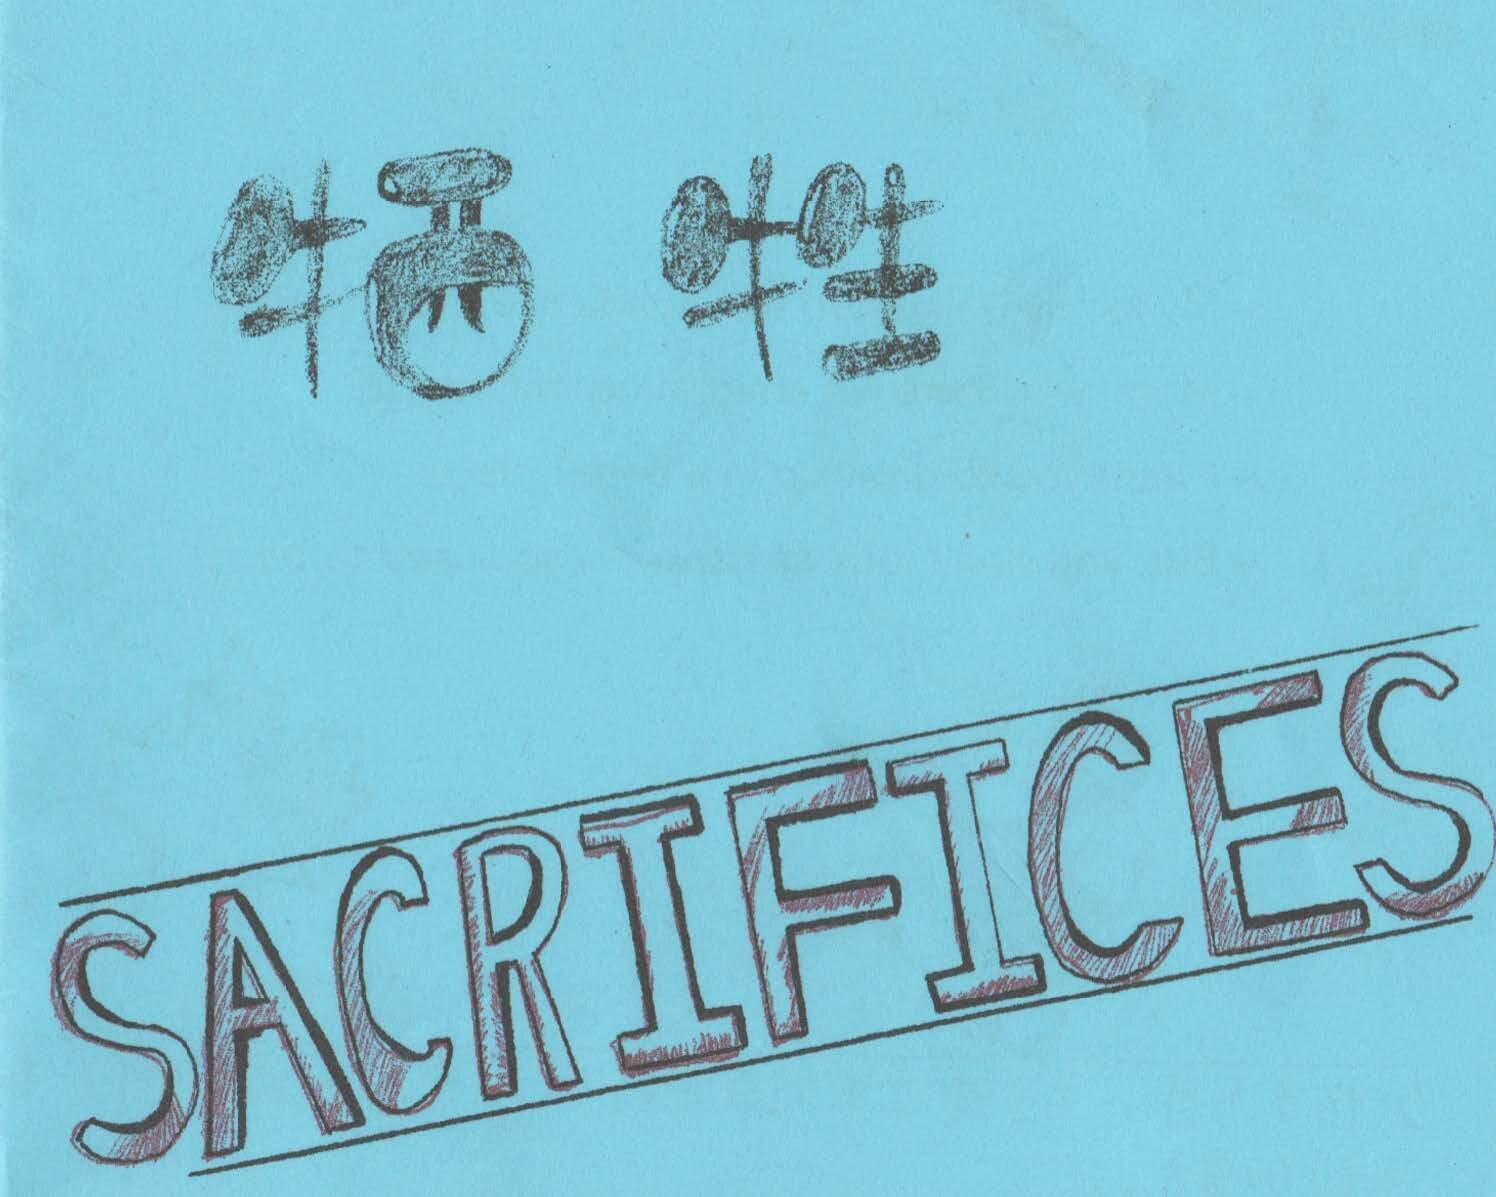 Sacrifices_Page_01_Image_0001.jpg